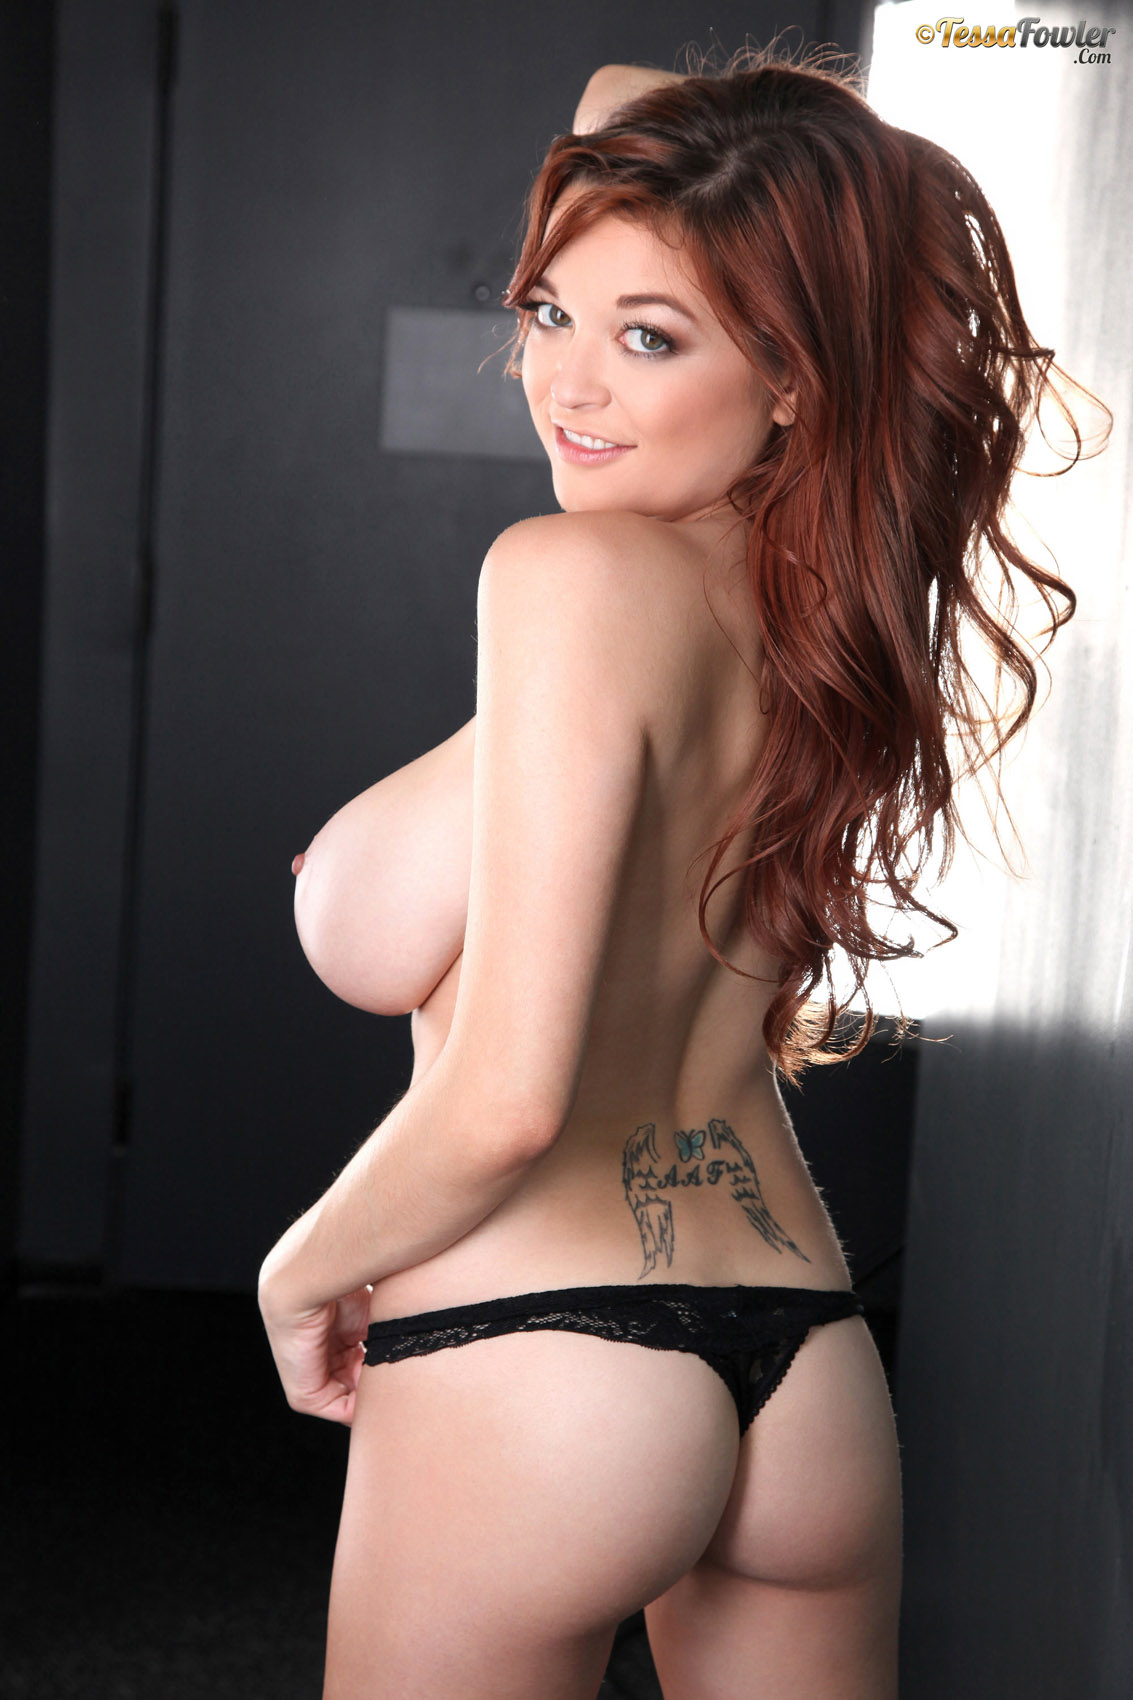 boobs underwear beautiful big in